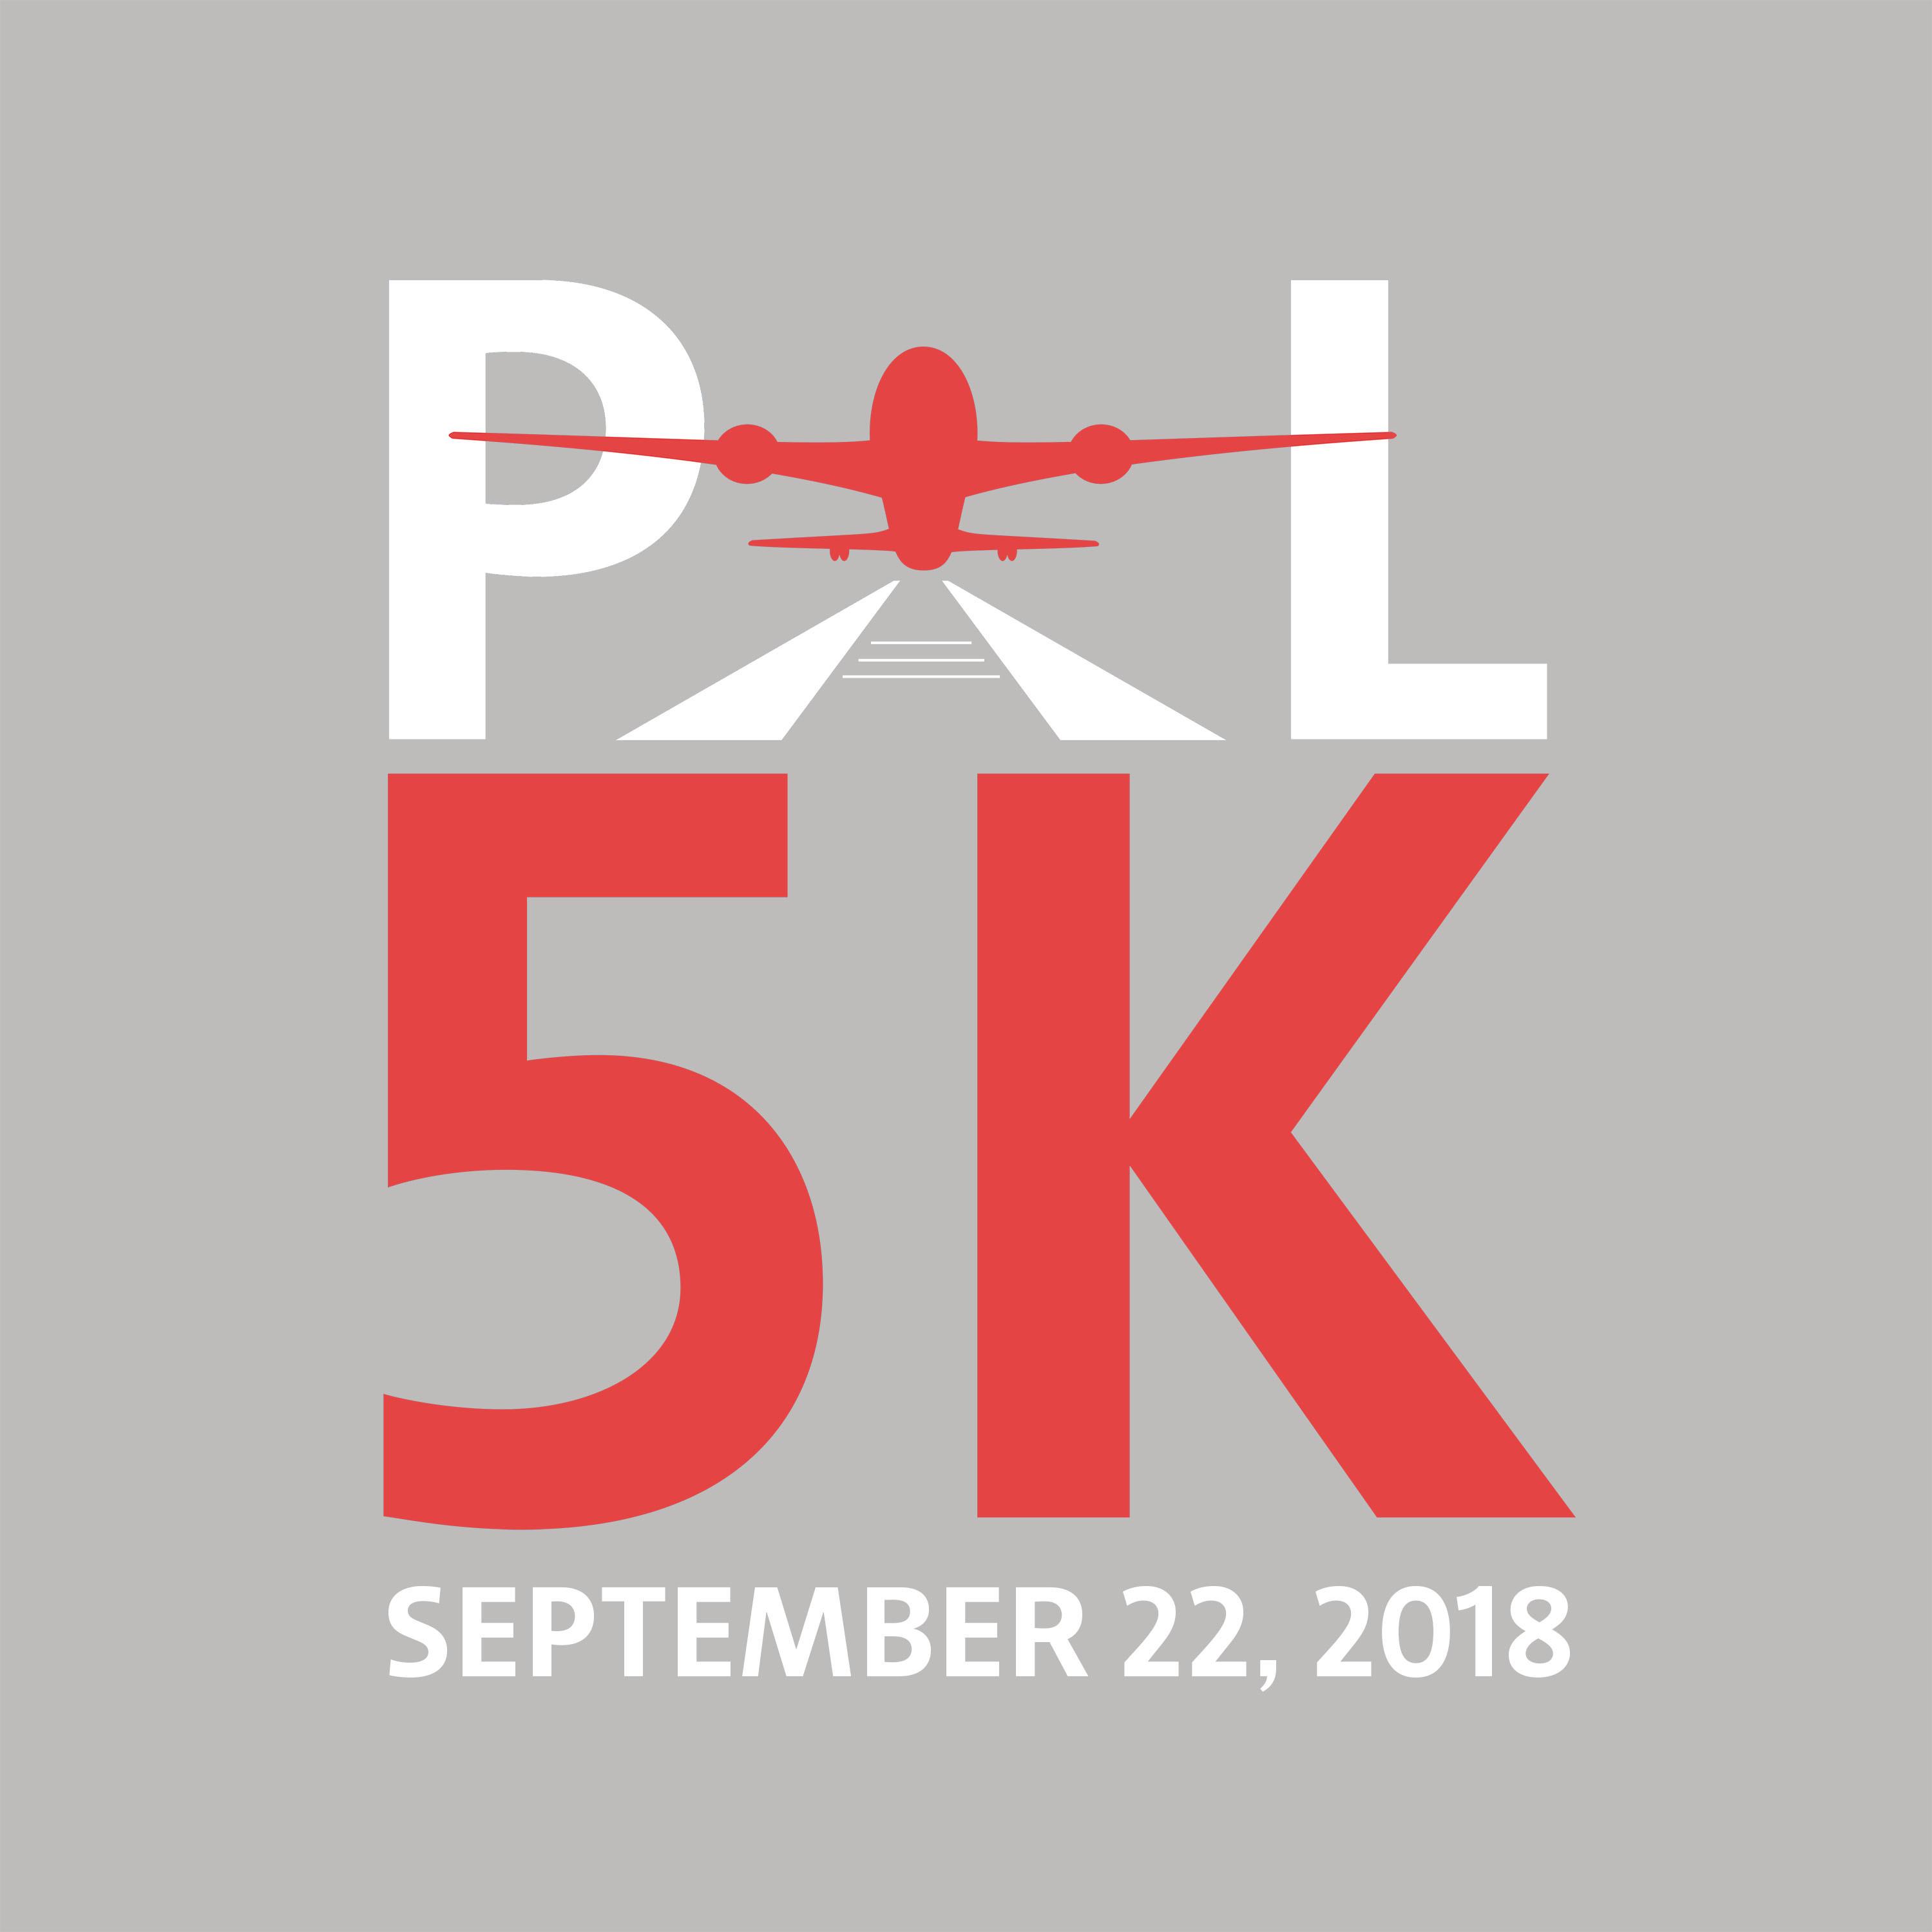 2018 2018 Philadelphia International Airport Runway 5k Race Roster